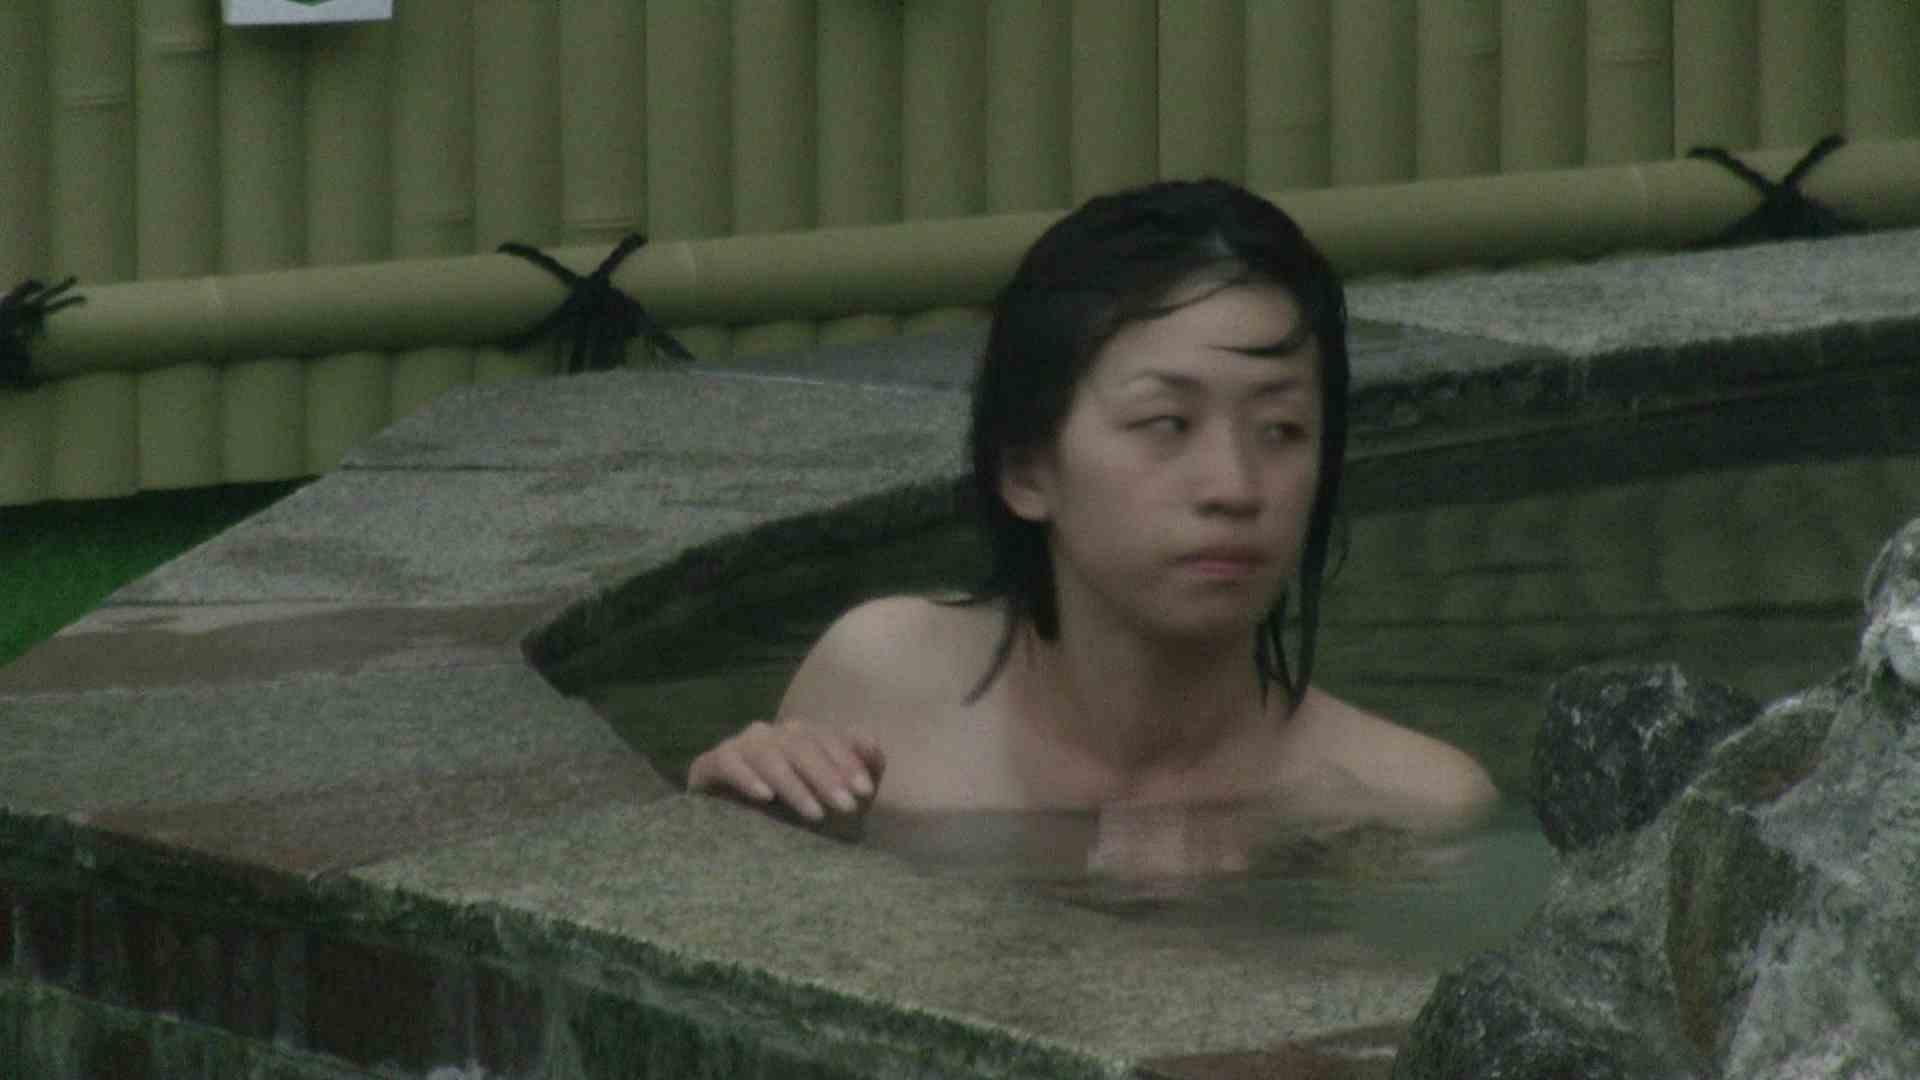 Aquaな露天風呂Vol.170 0  65連発 40